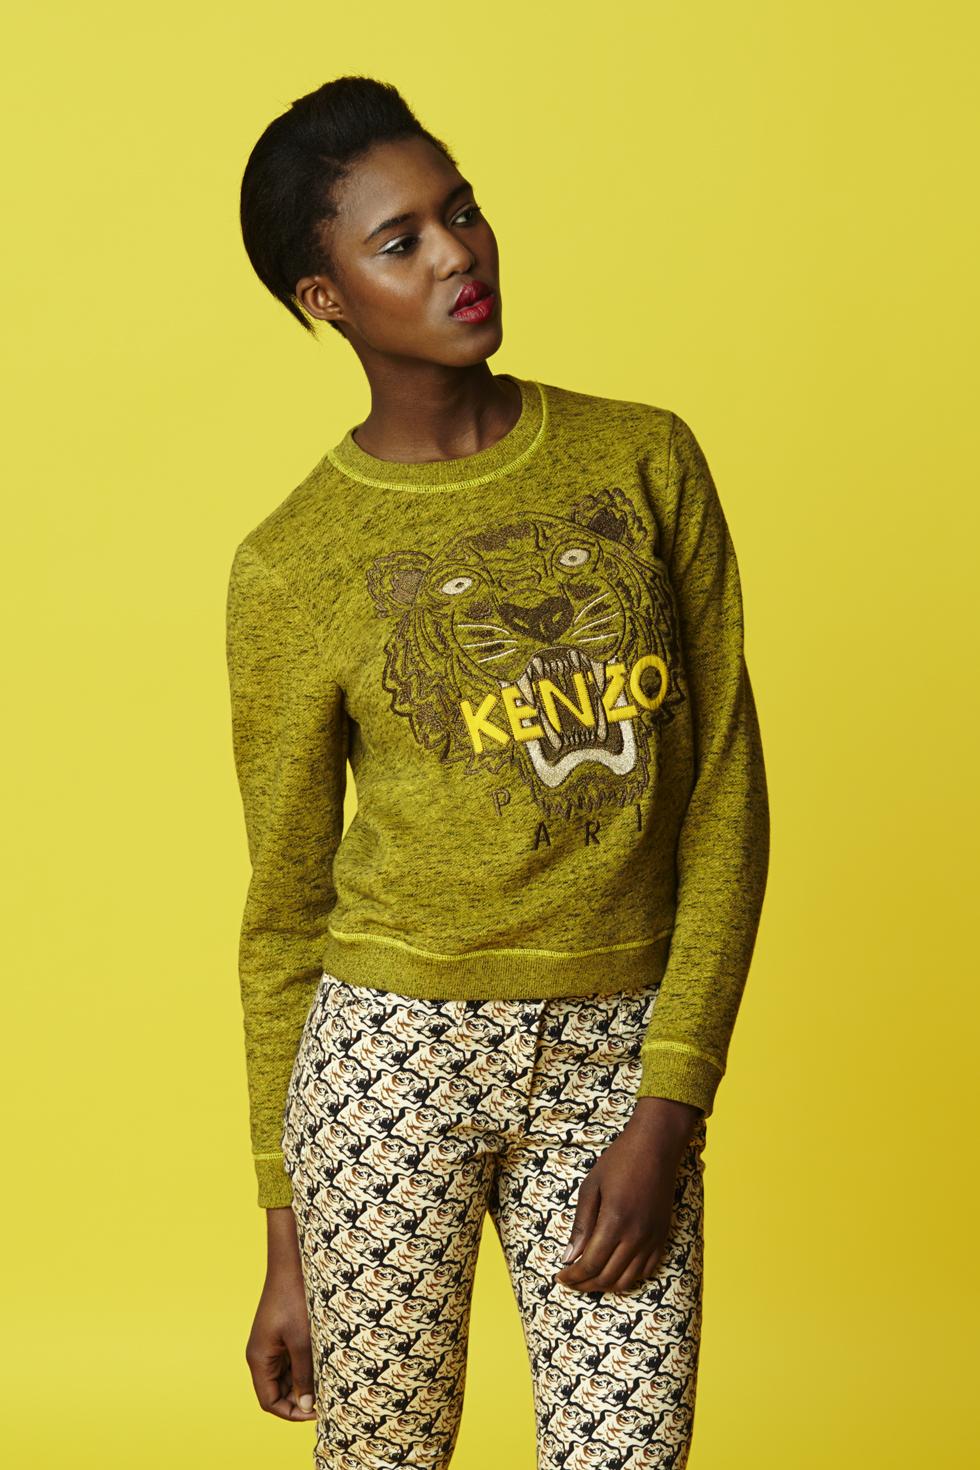 Sweatshirt tête de tigre Kenzo - Collection permanente Kenzo Femme - E-Shop Kenzo | Kenzo.com